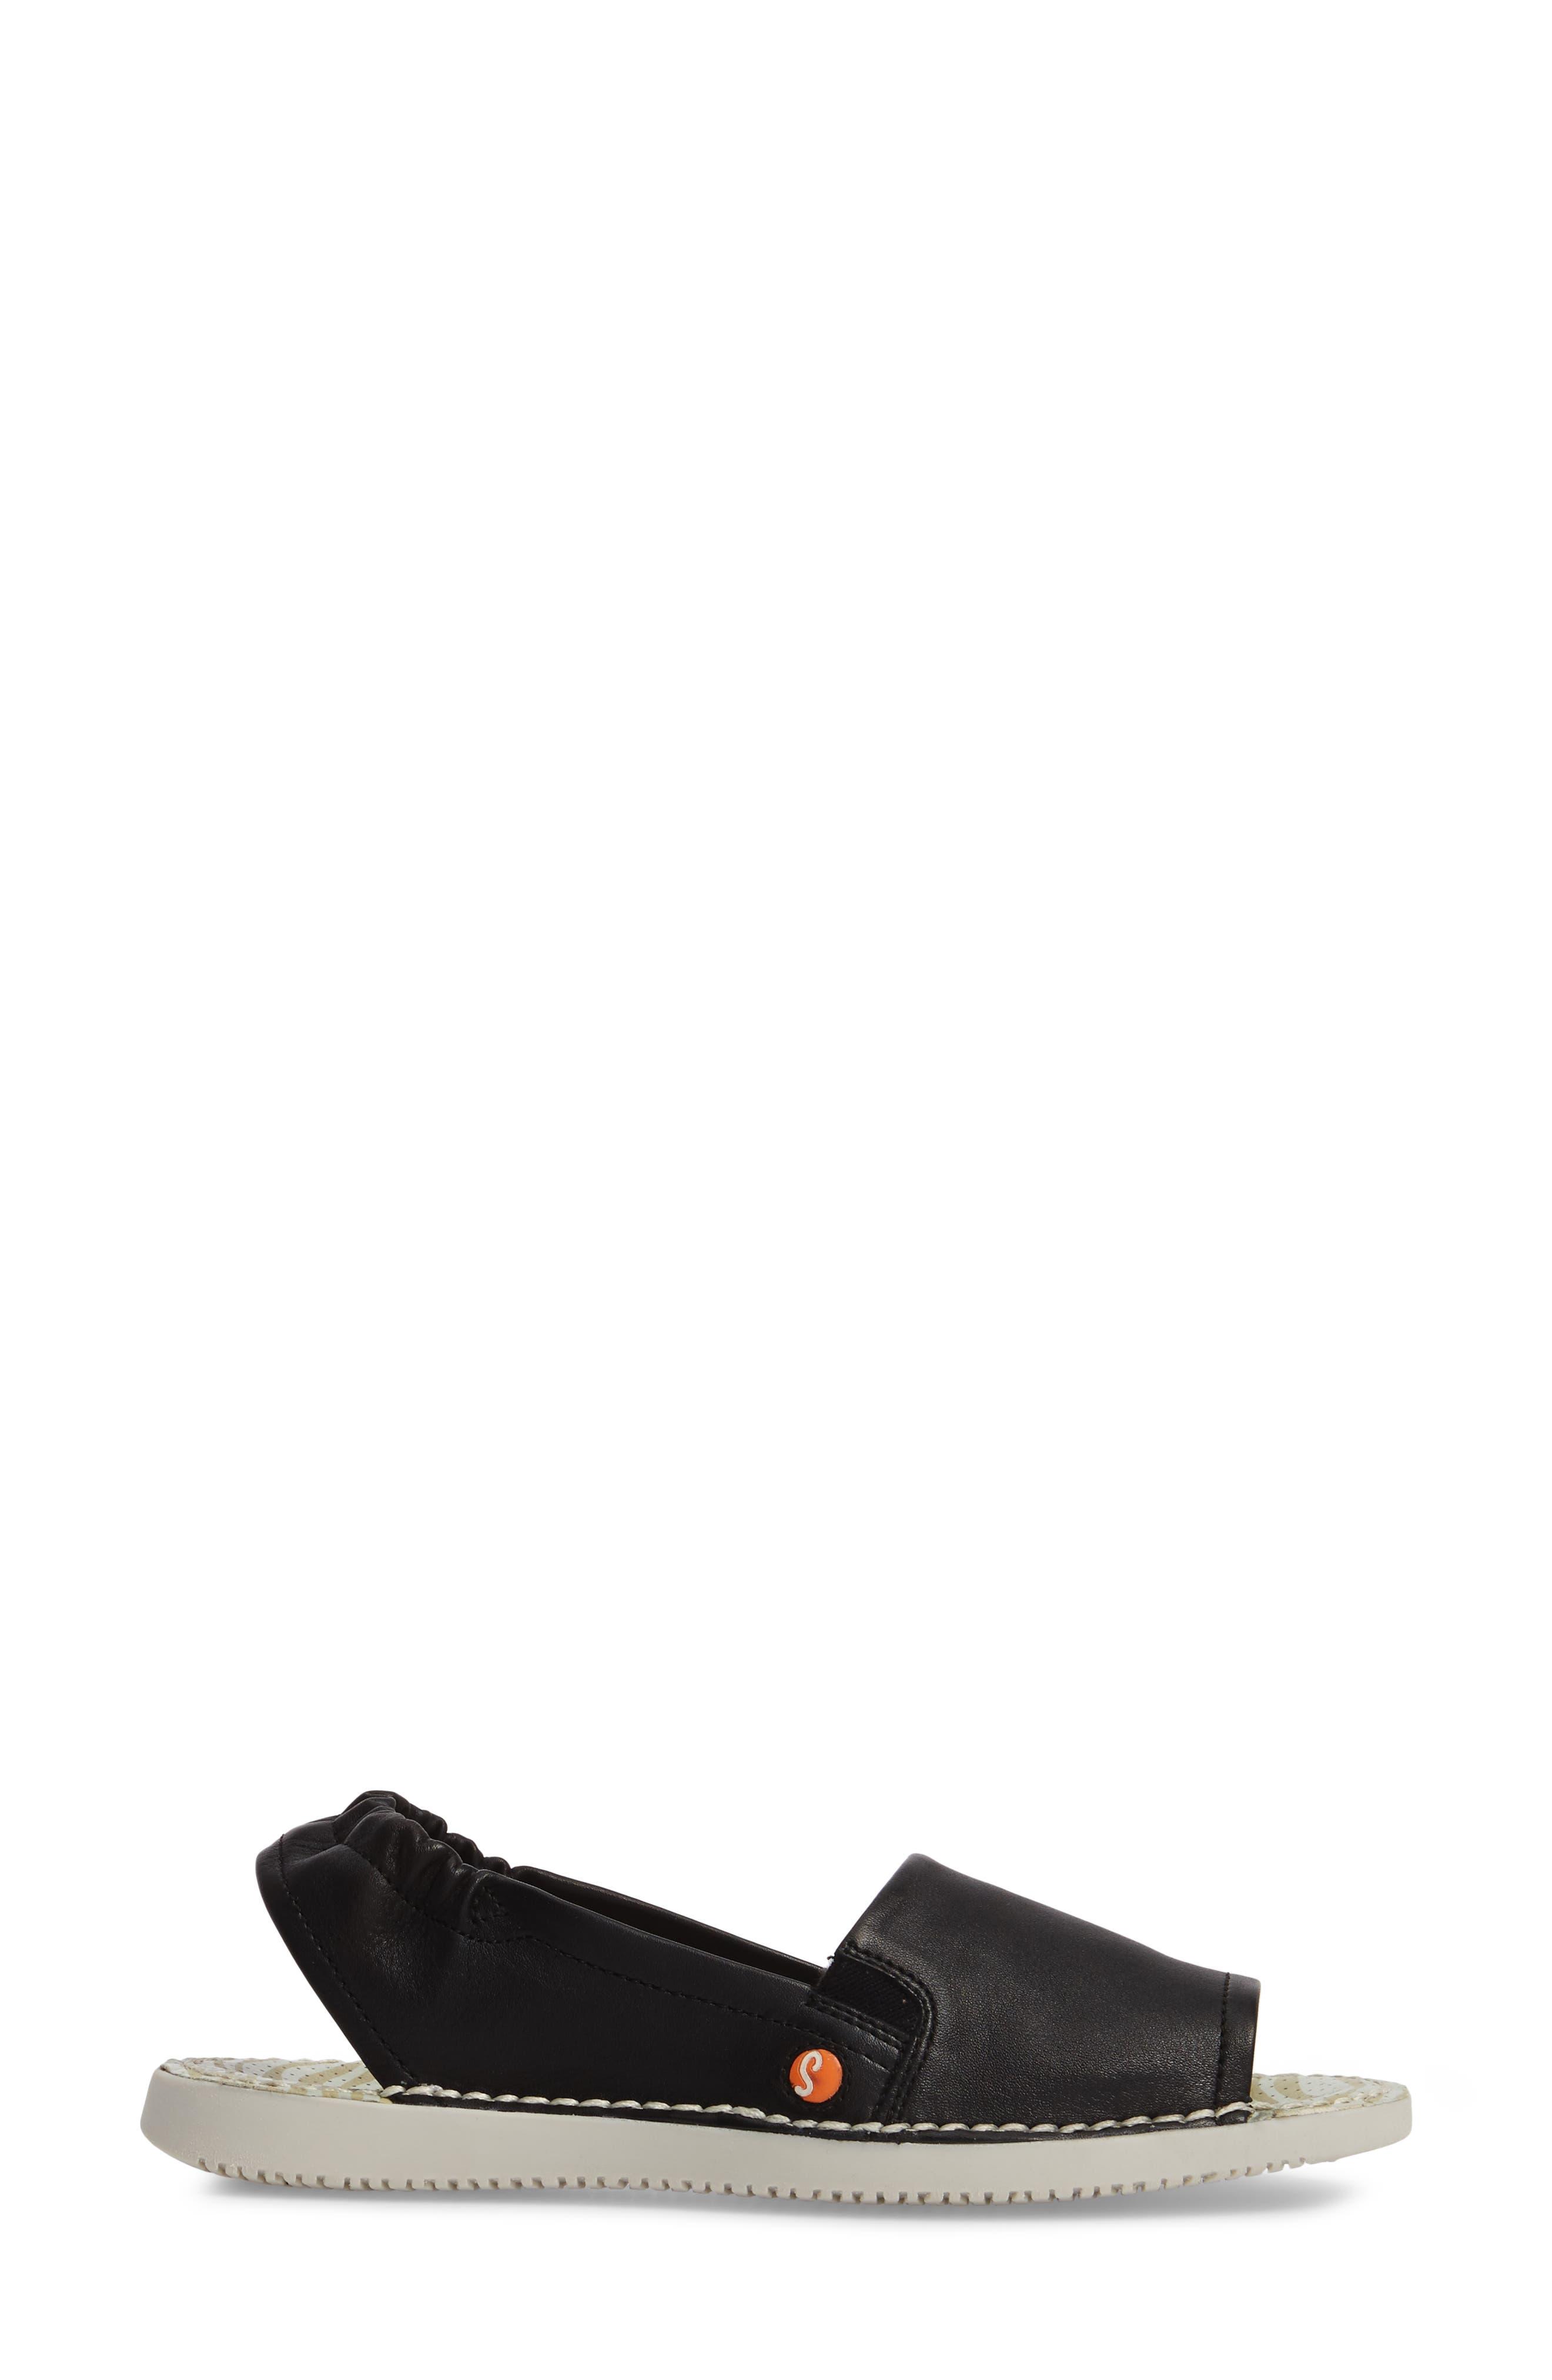 Tee Flat Sandal,                             Alternate thumbnail 3, color,                             BLACK LEATHER